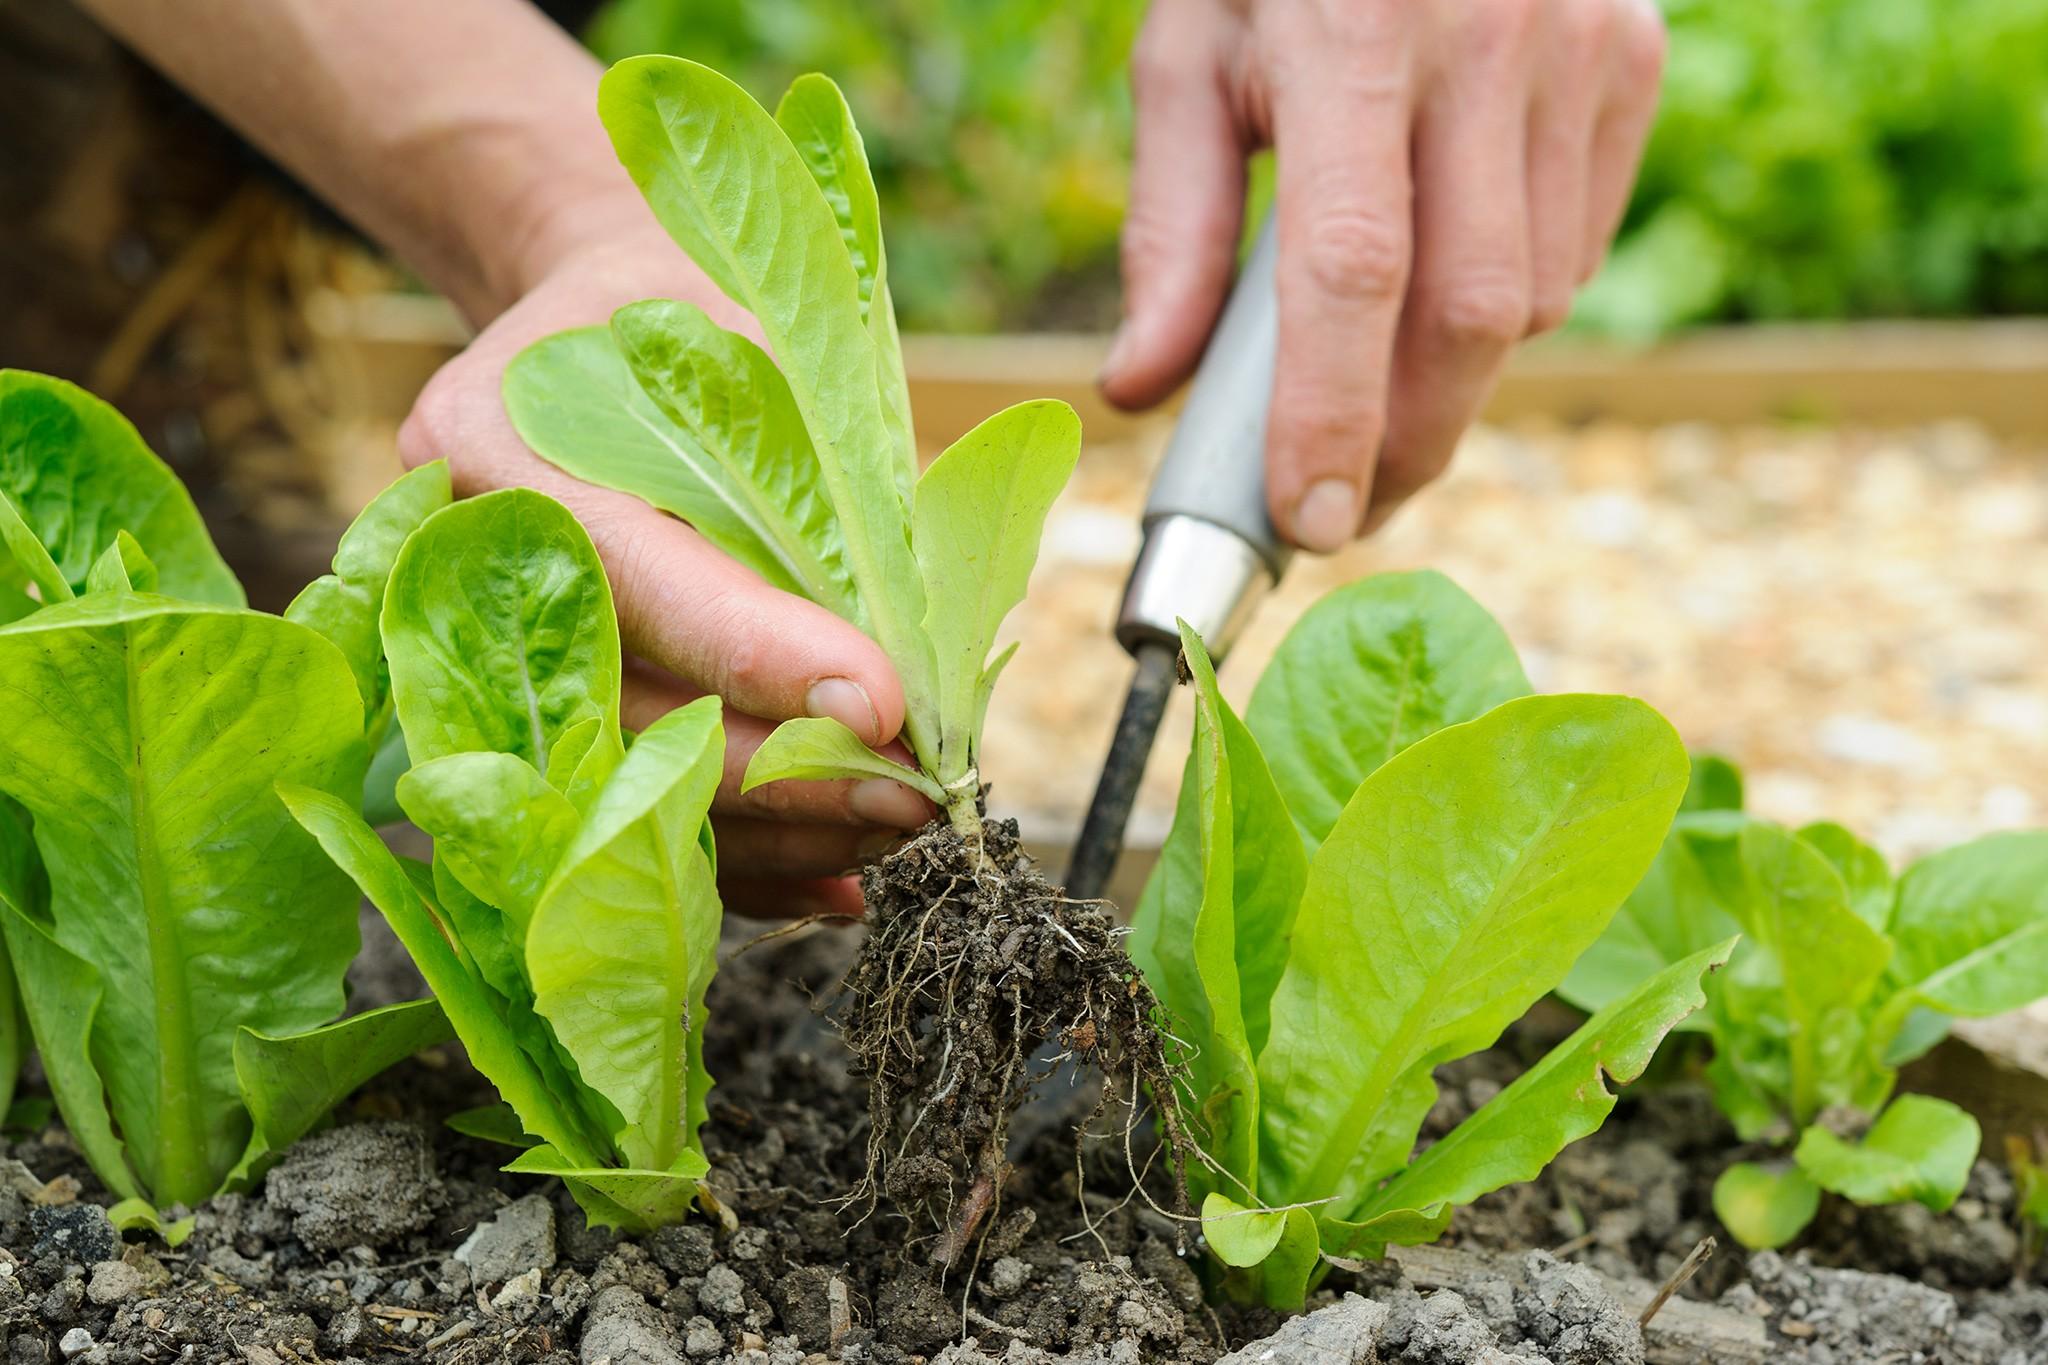 Harvesting lettuces